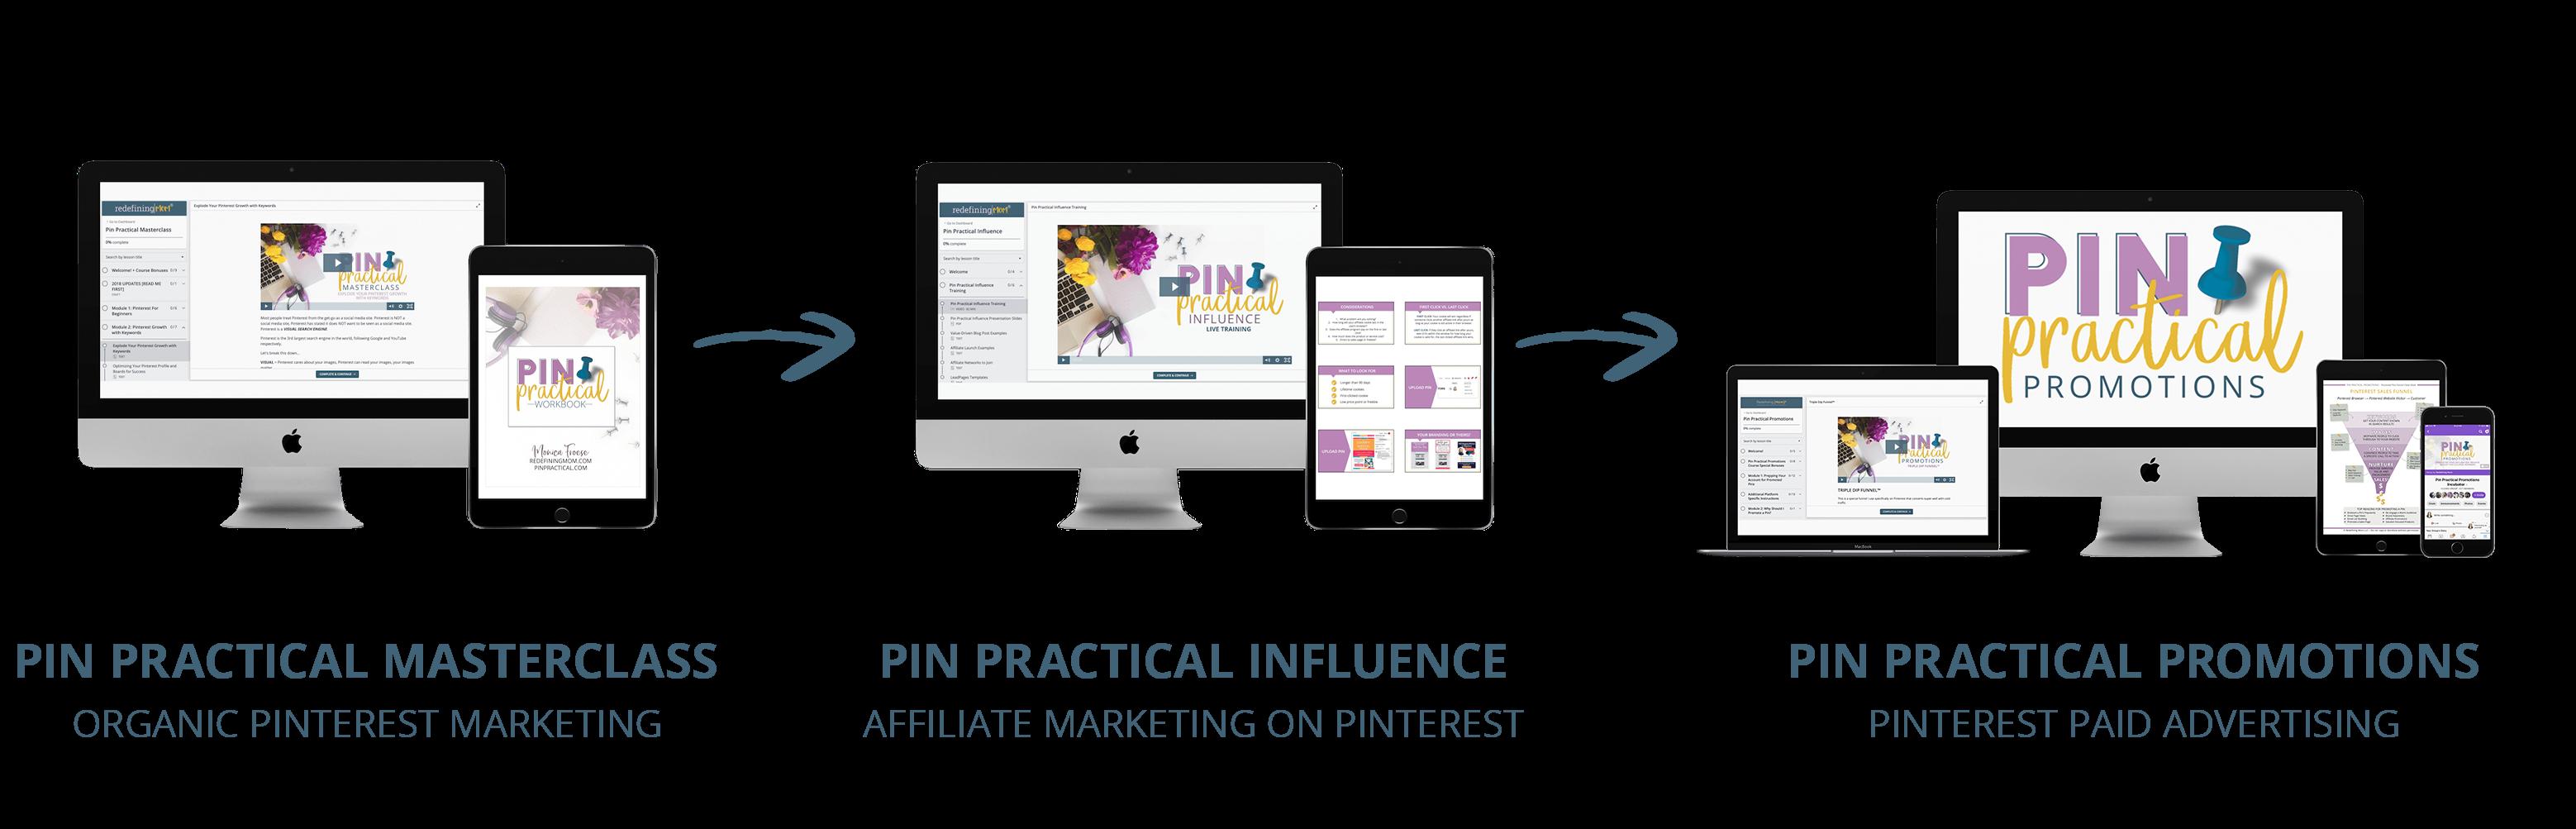 Save big on Pinterest Marketing courses!